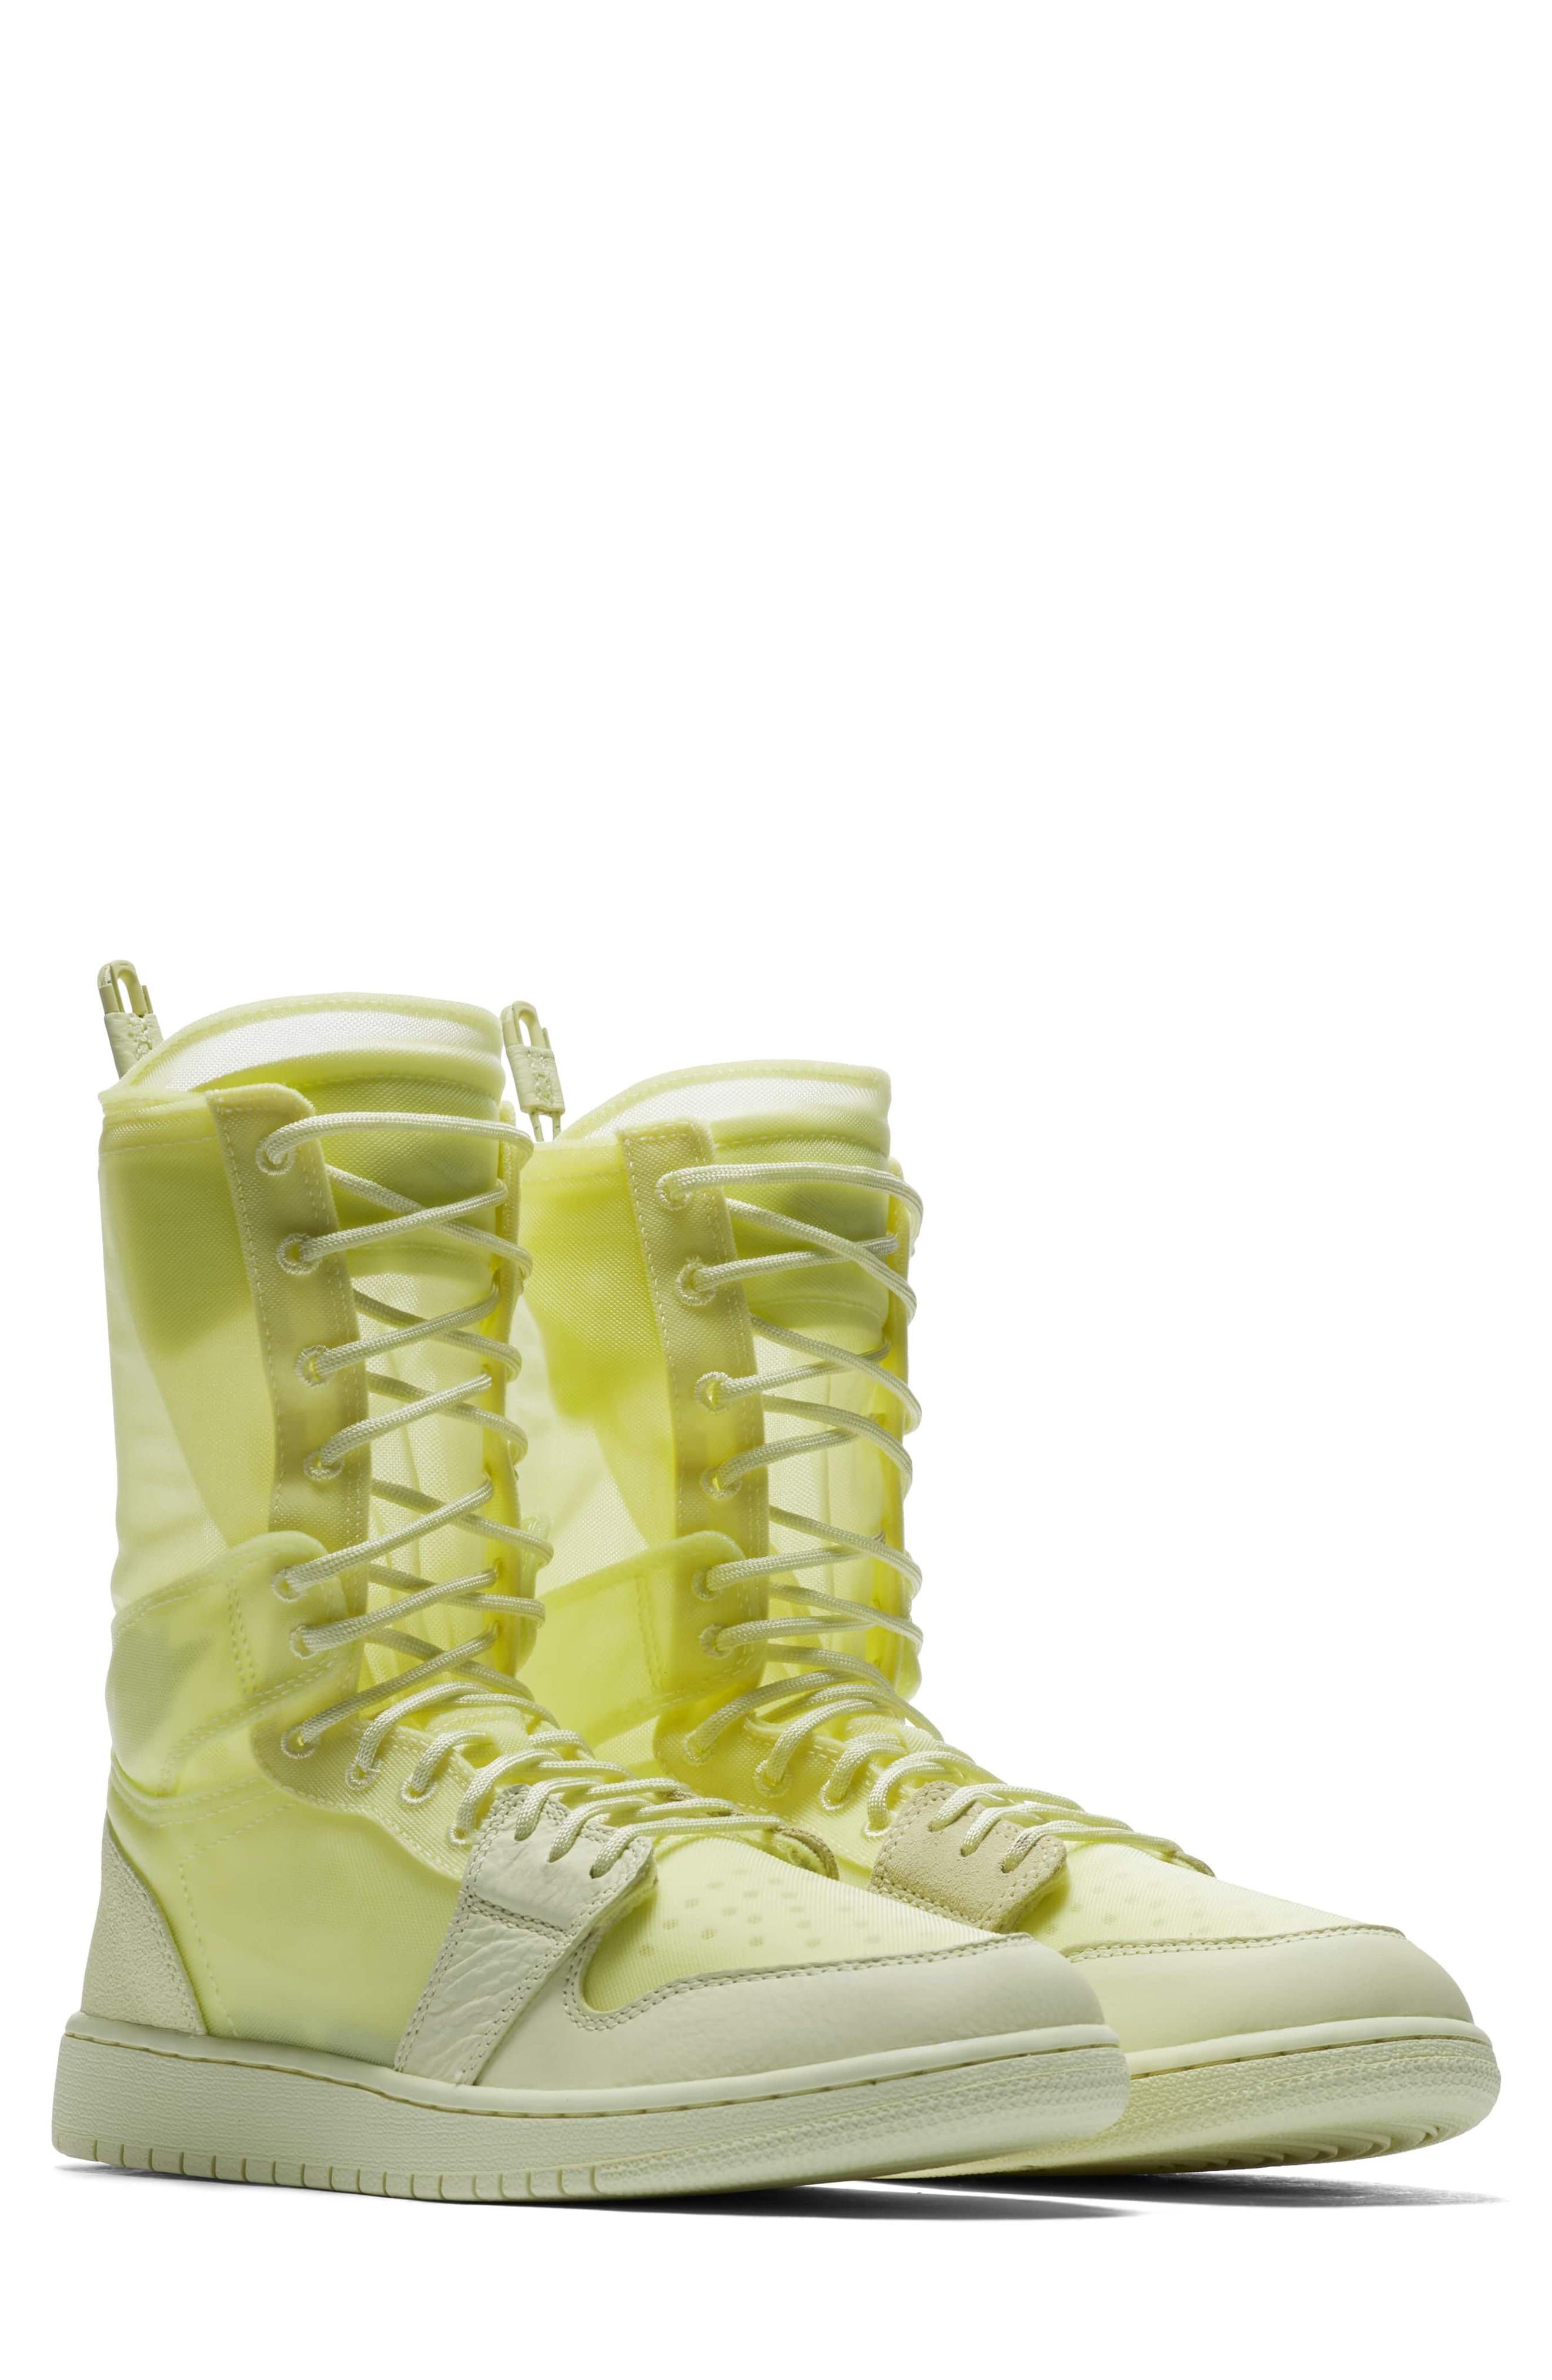 timeless design 125b2 f2537 Air Jordan 1 Explorer Xx Convertible High Top Sneaker in Luminous Green